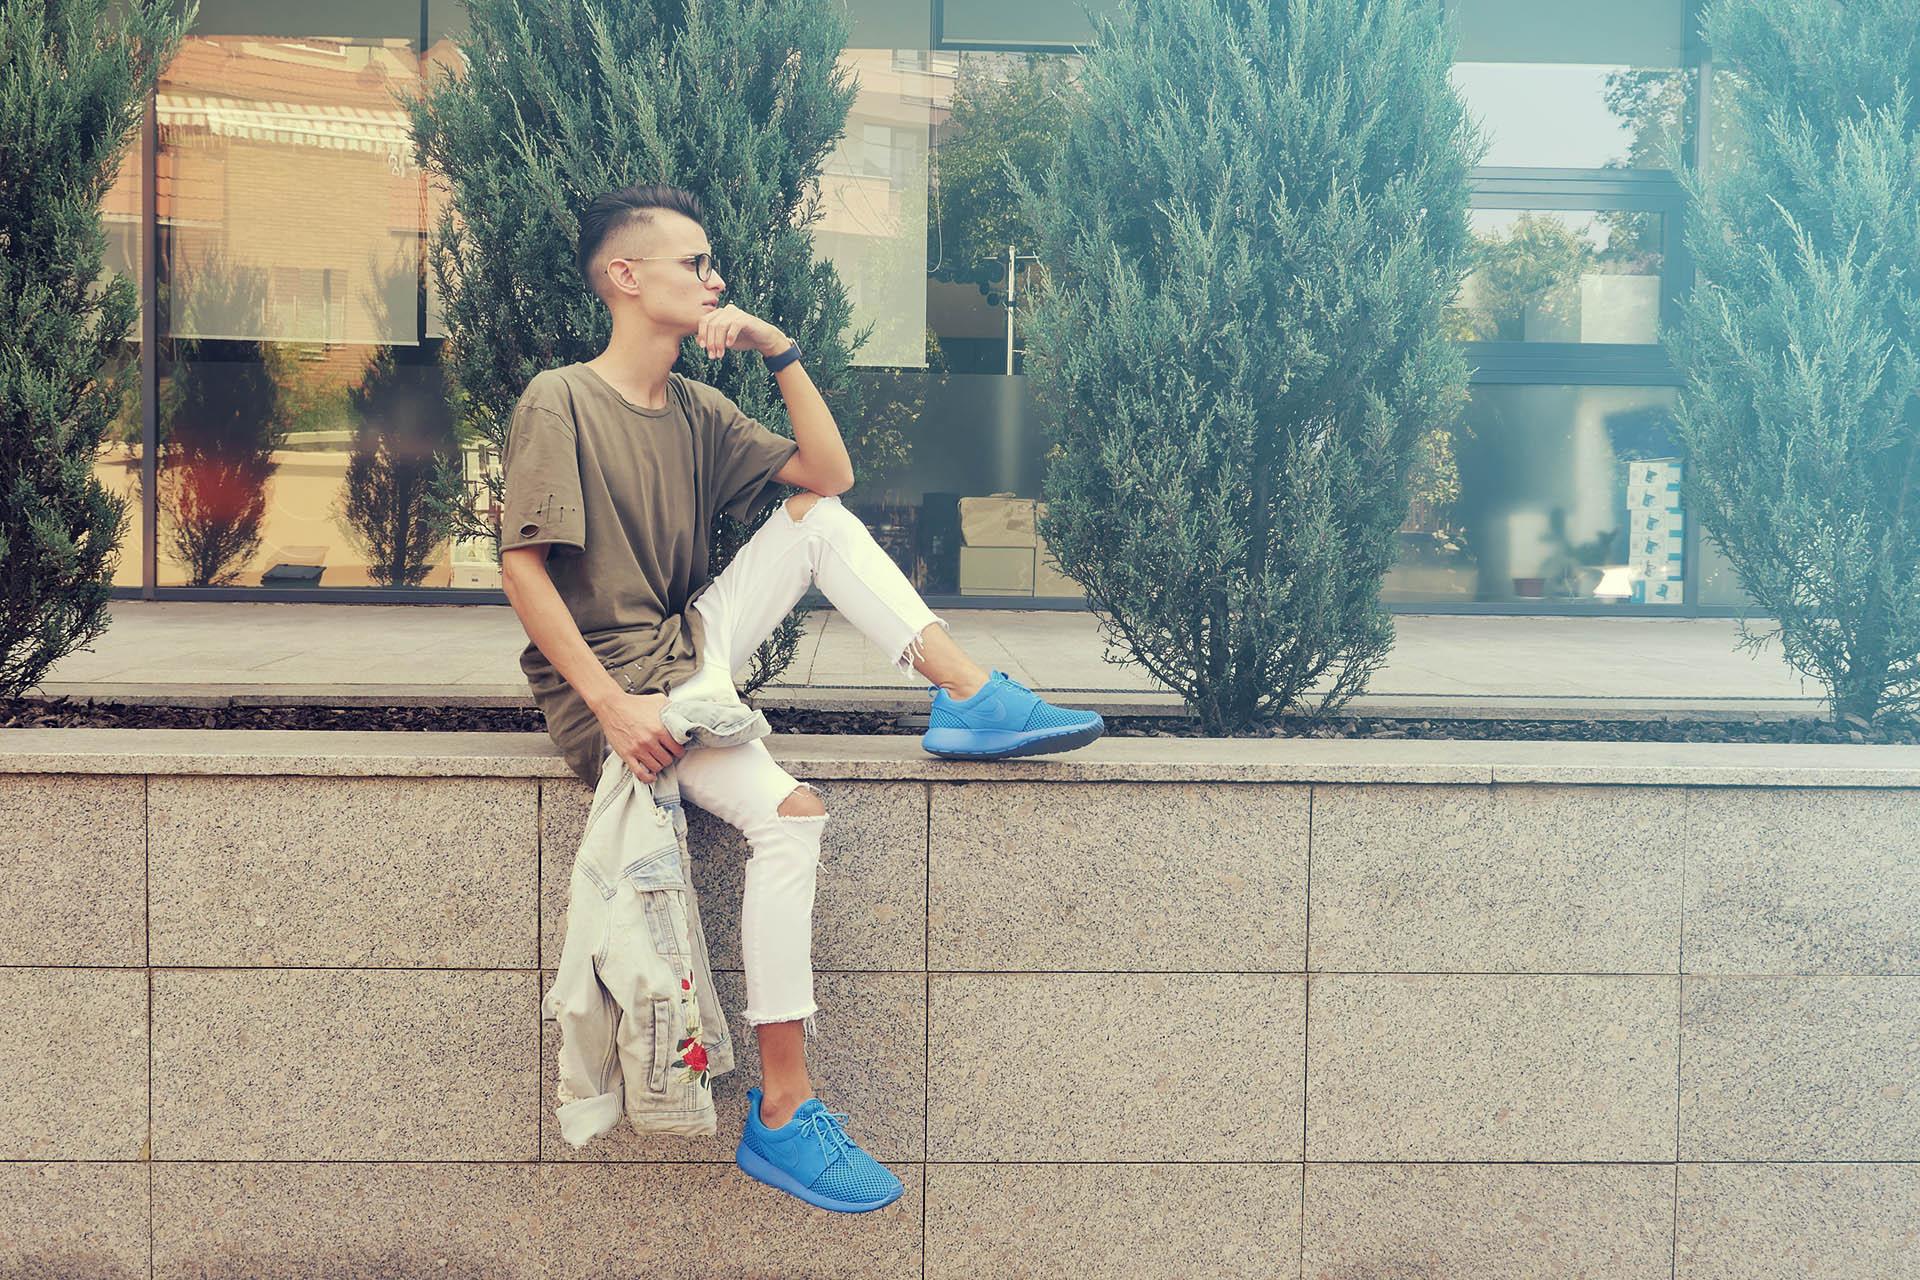 Tricou Calvin Klein, Jeans Primo Emporio, Jachetă Zara, pantofi sport Nike